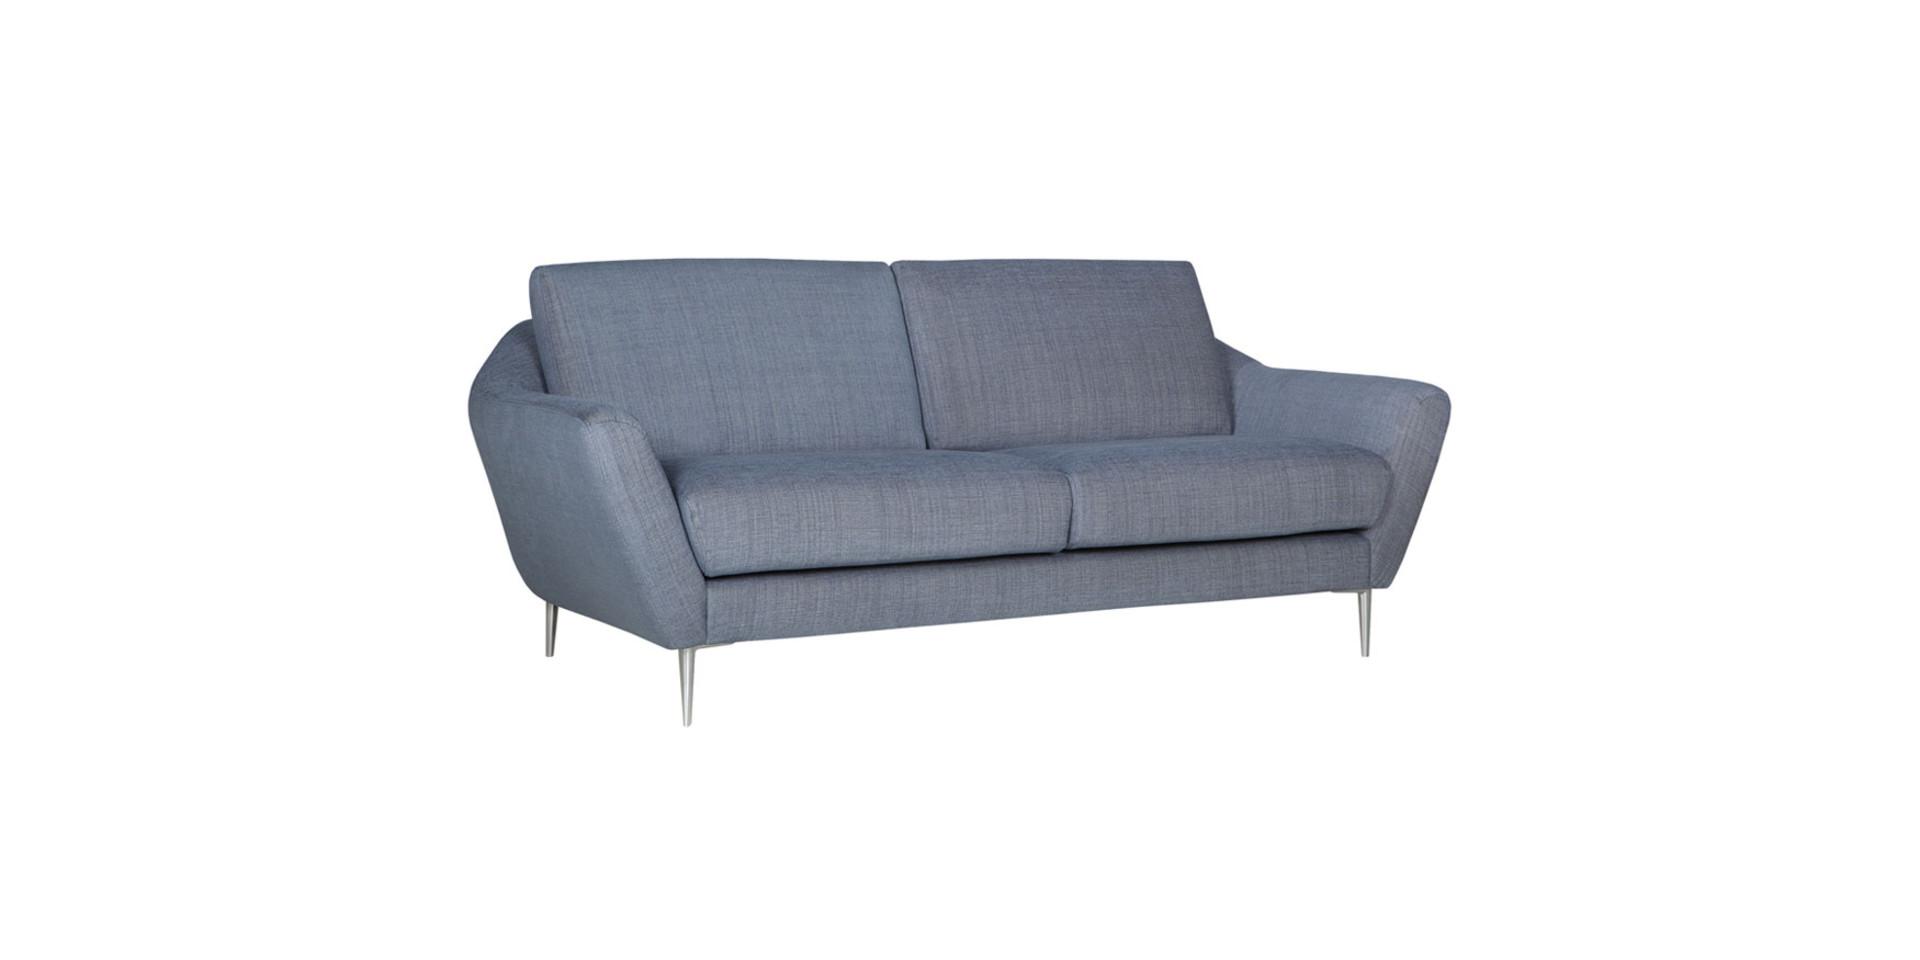 sits-agda-canape-25seater_mattis45_blue_2